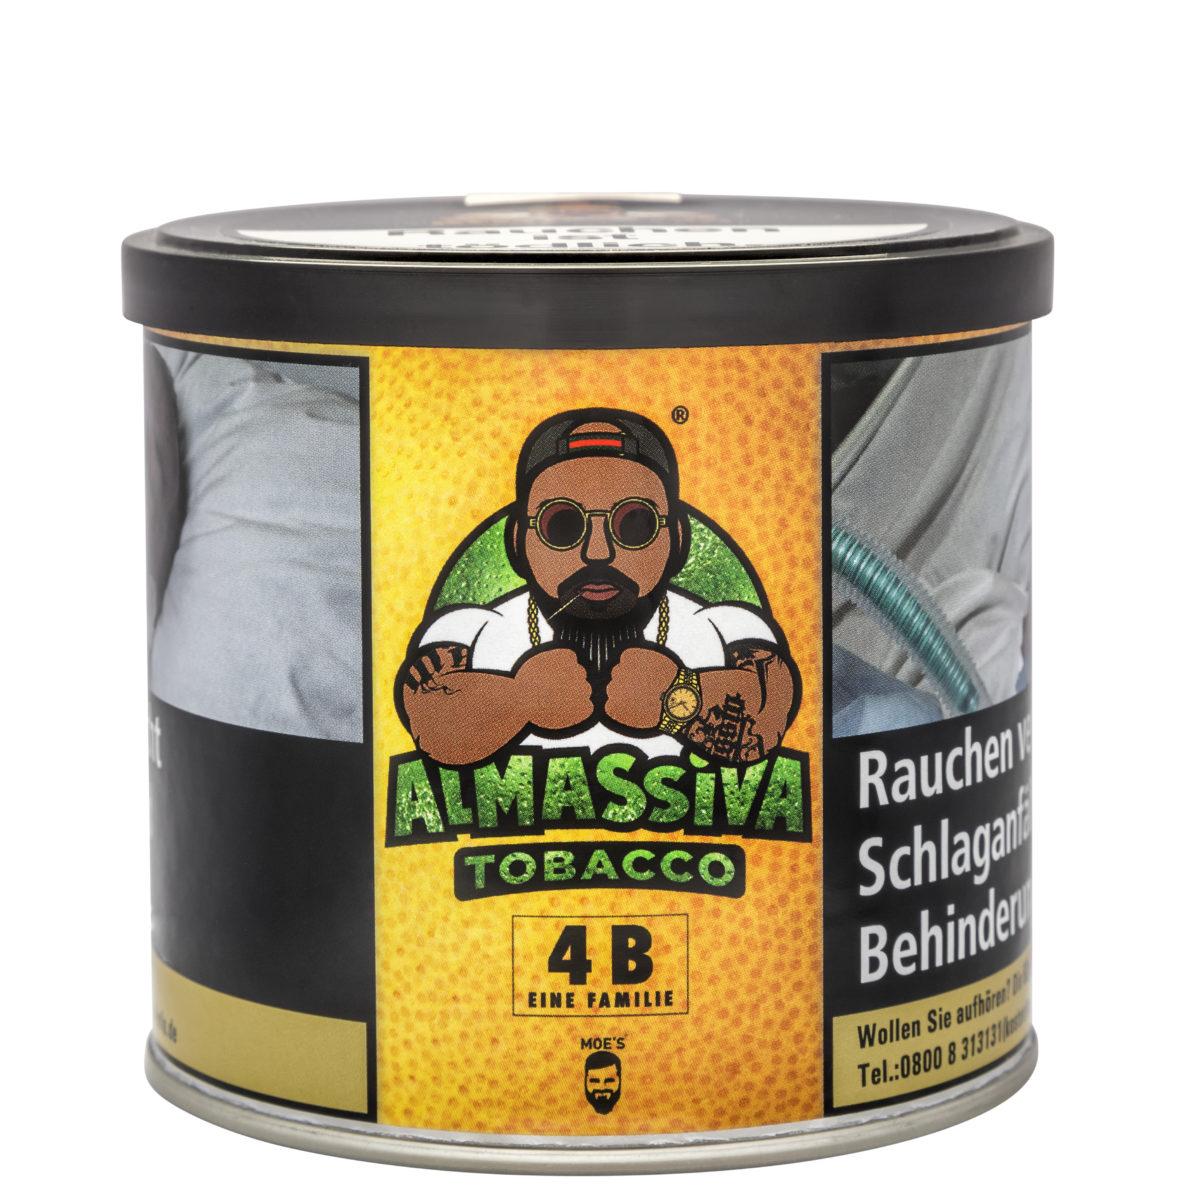 ALMASSIVA Tobacco - 4B